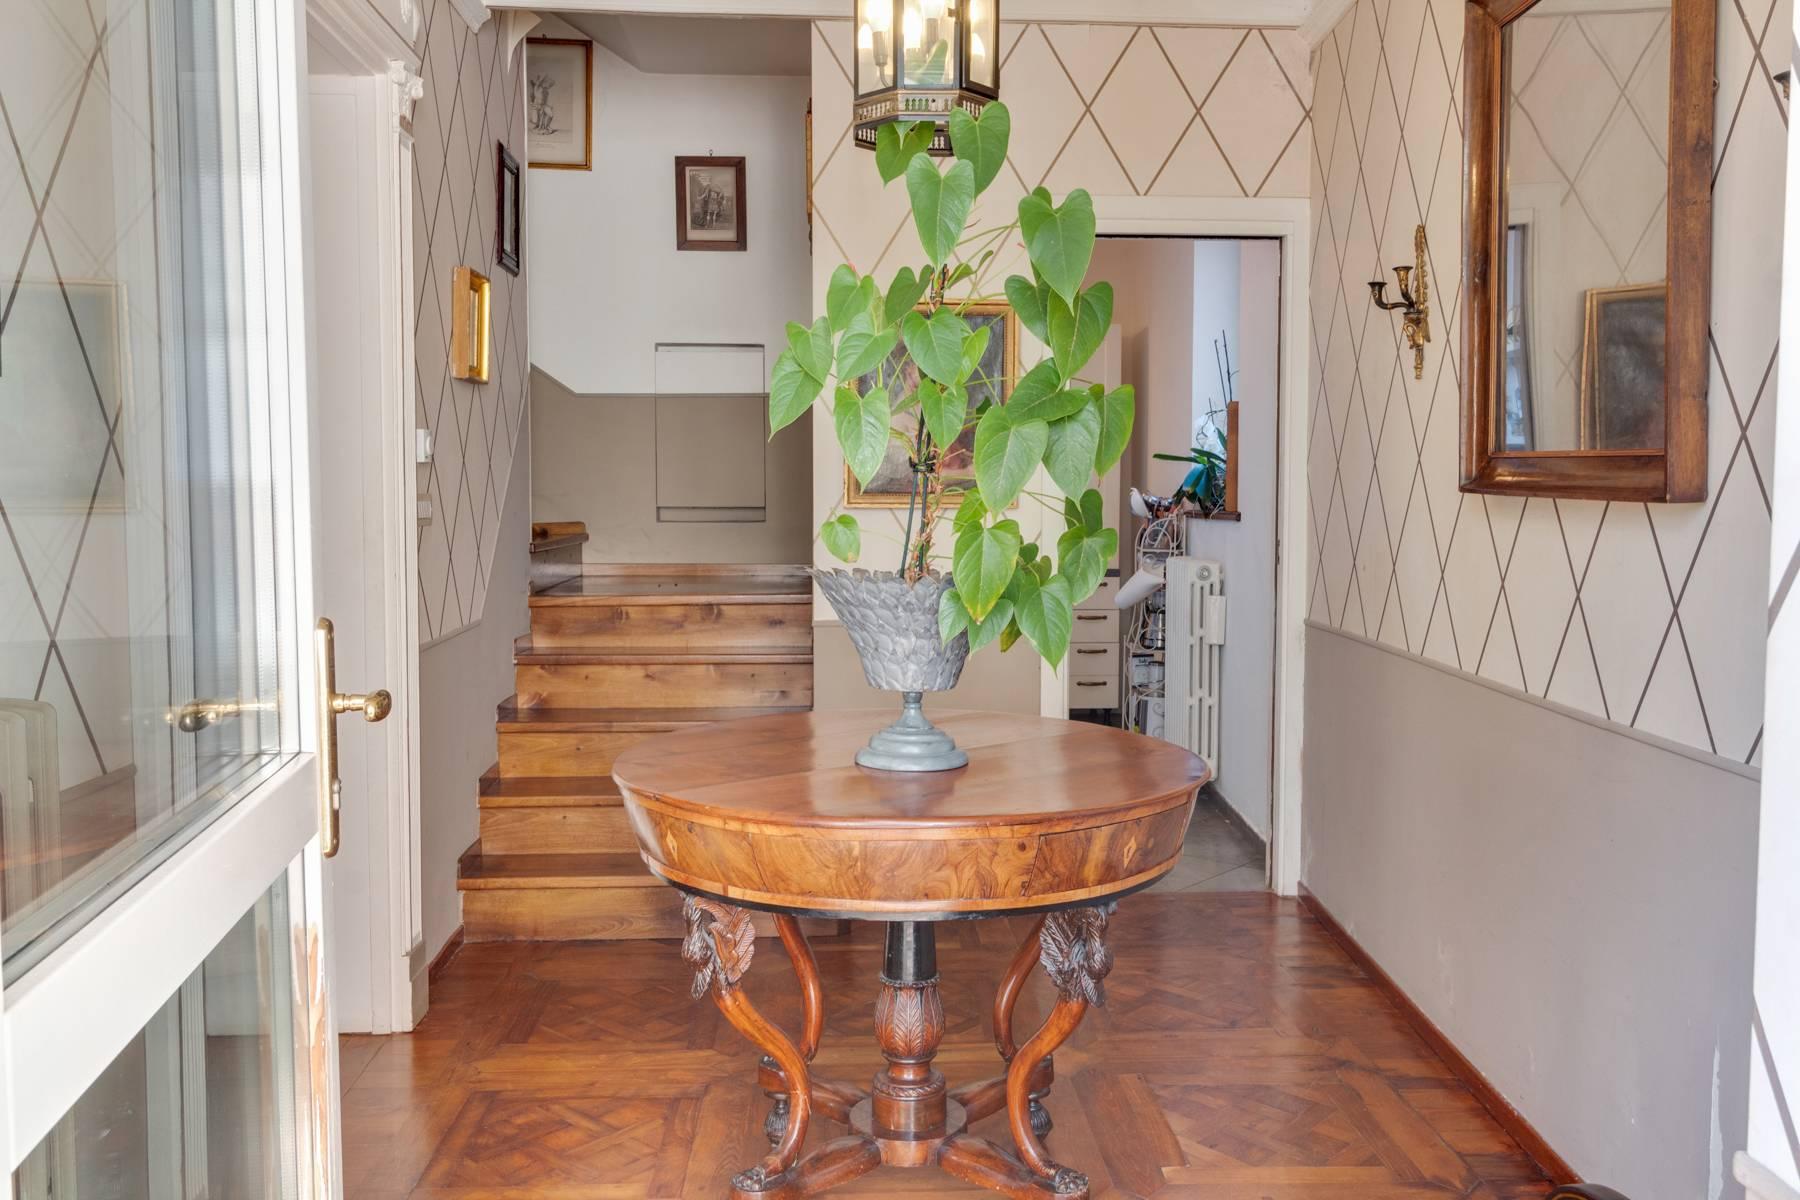 Casa indipendente in Vendita a Torino: 5 locali, 270 mq - Foto 15